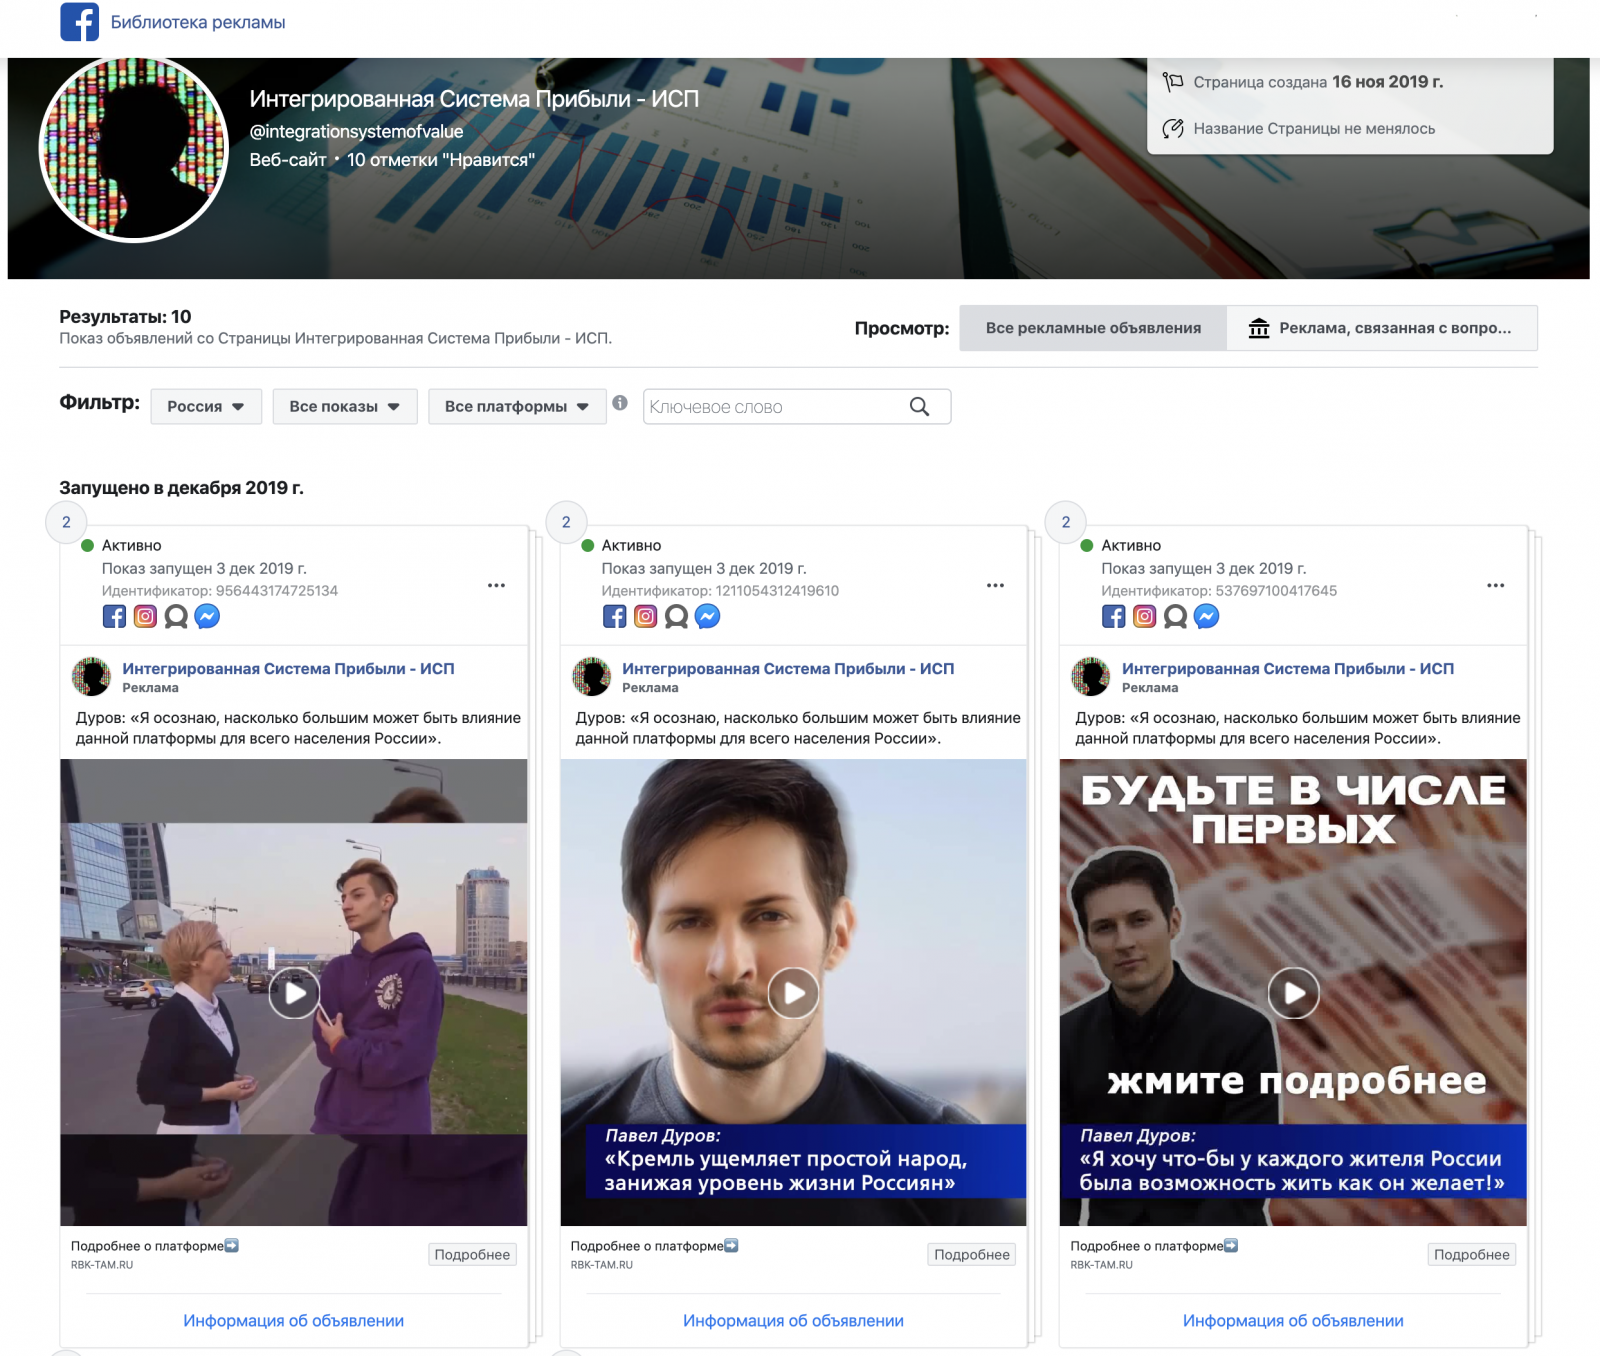 Facebook Ads Liborery